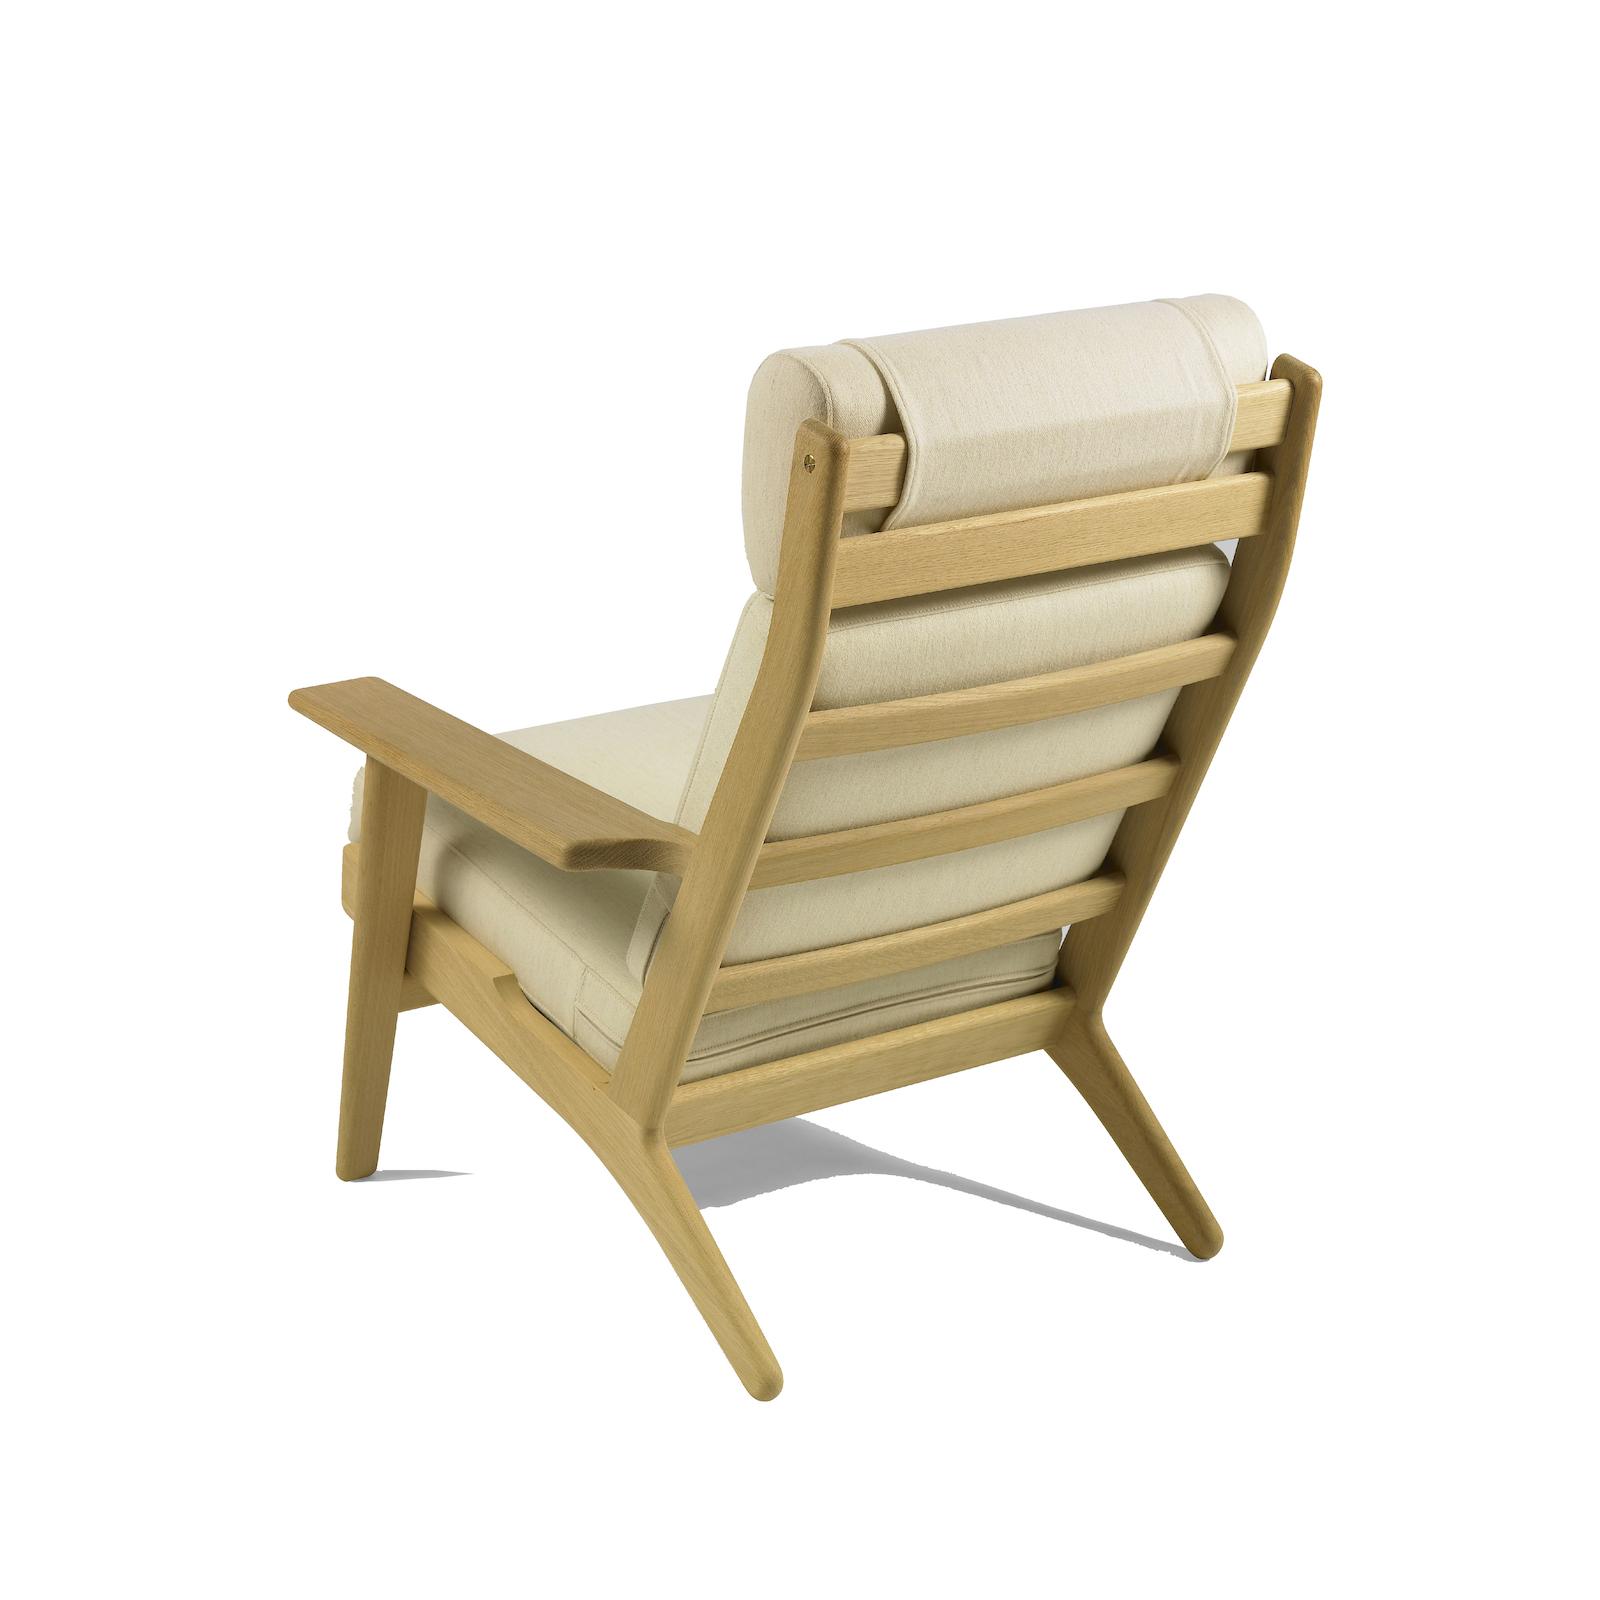 GE_290A_Lounge_Chair_Getama_Hans_Wegner_Gestalt_NewYork_2.JPG